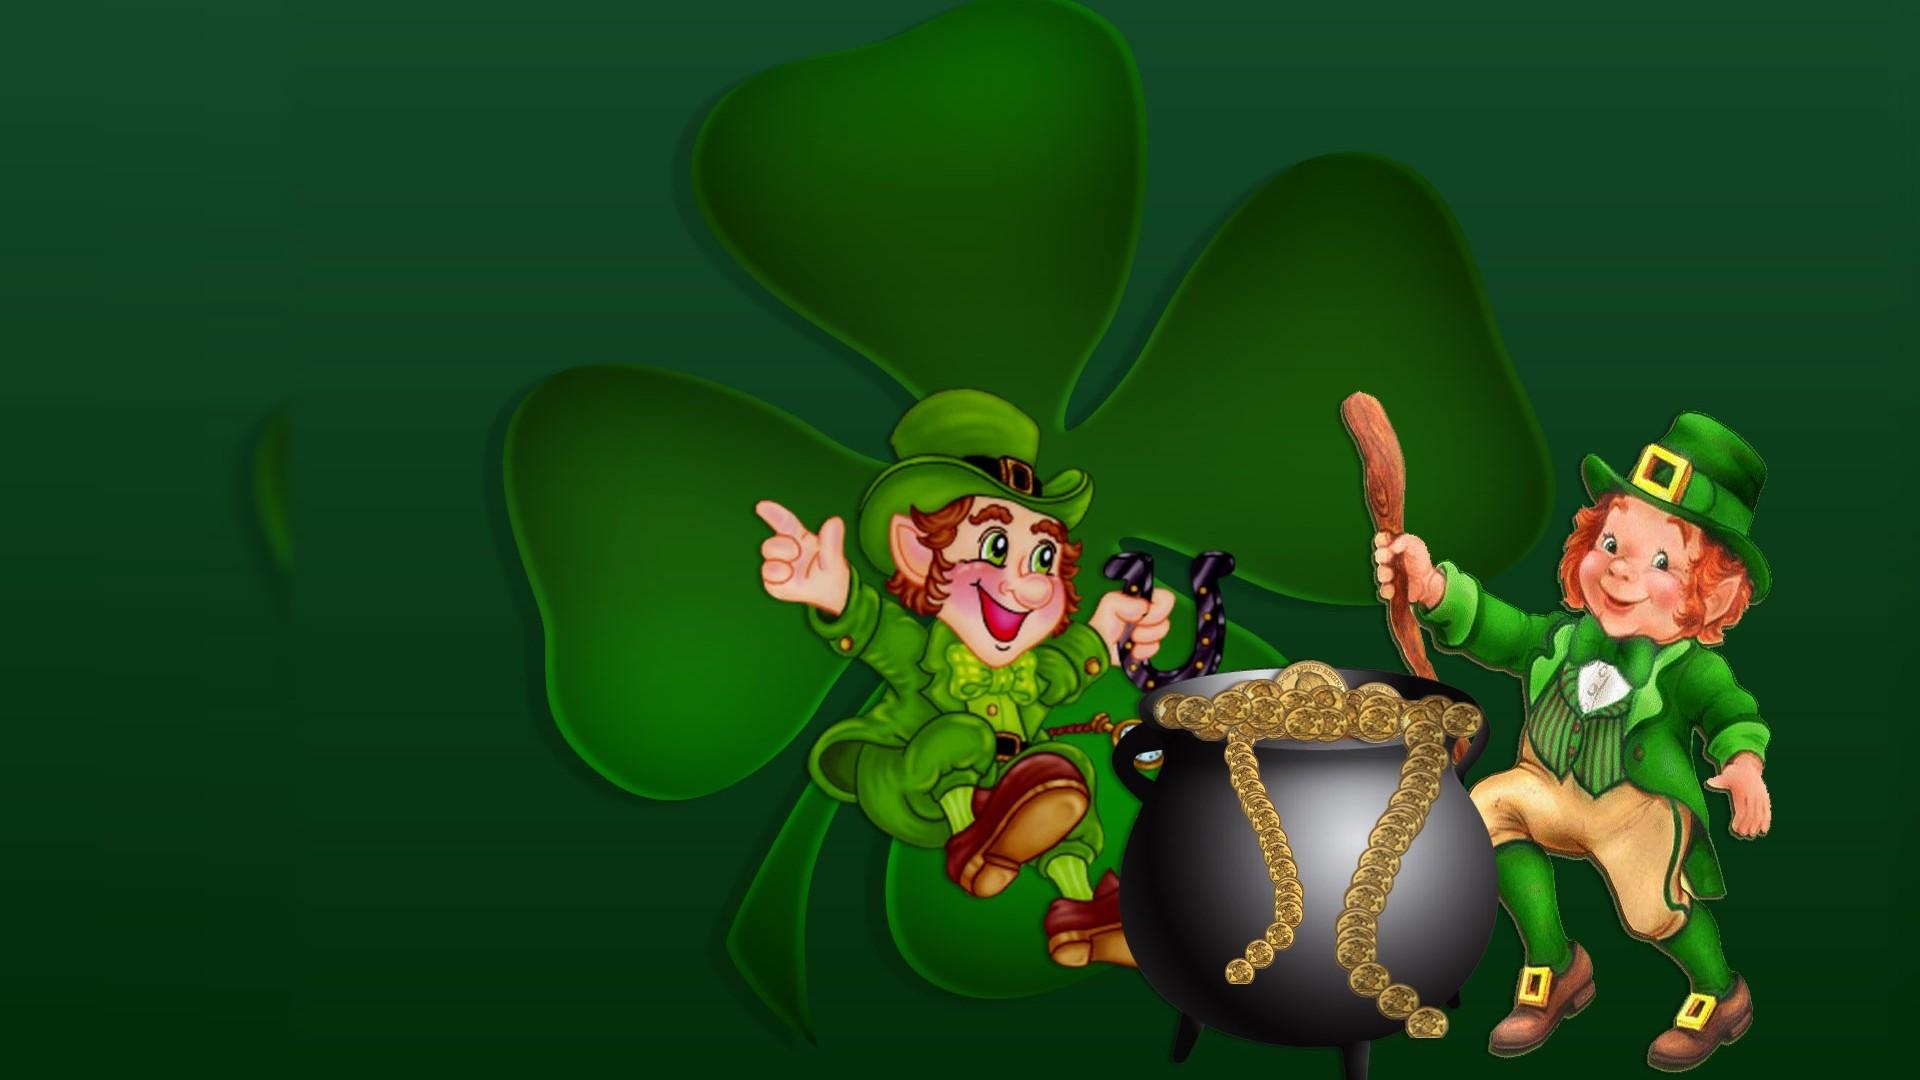 St. Patrick's Day Wallpaper Desktop